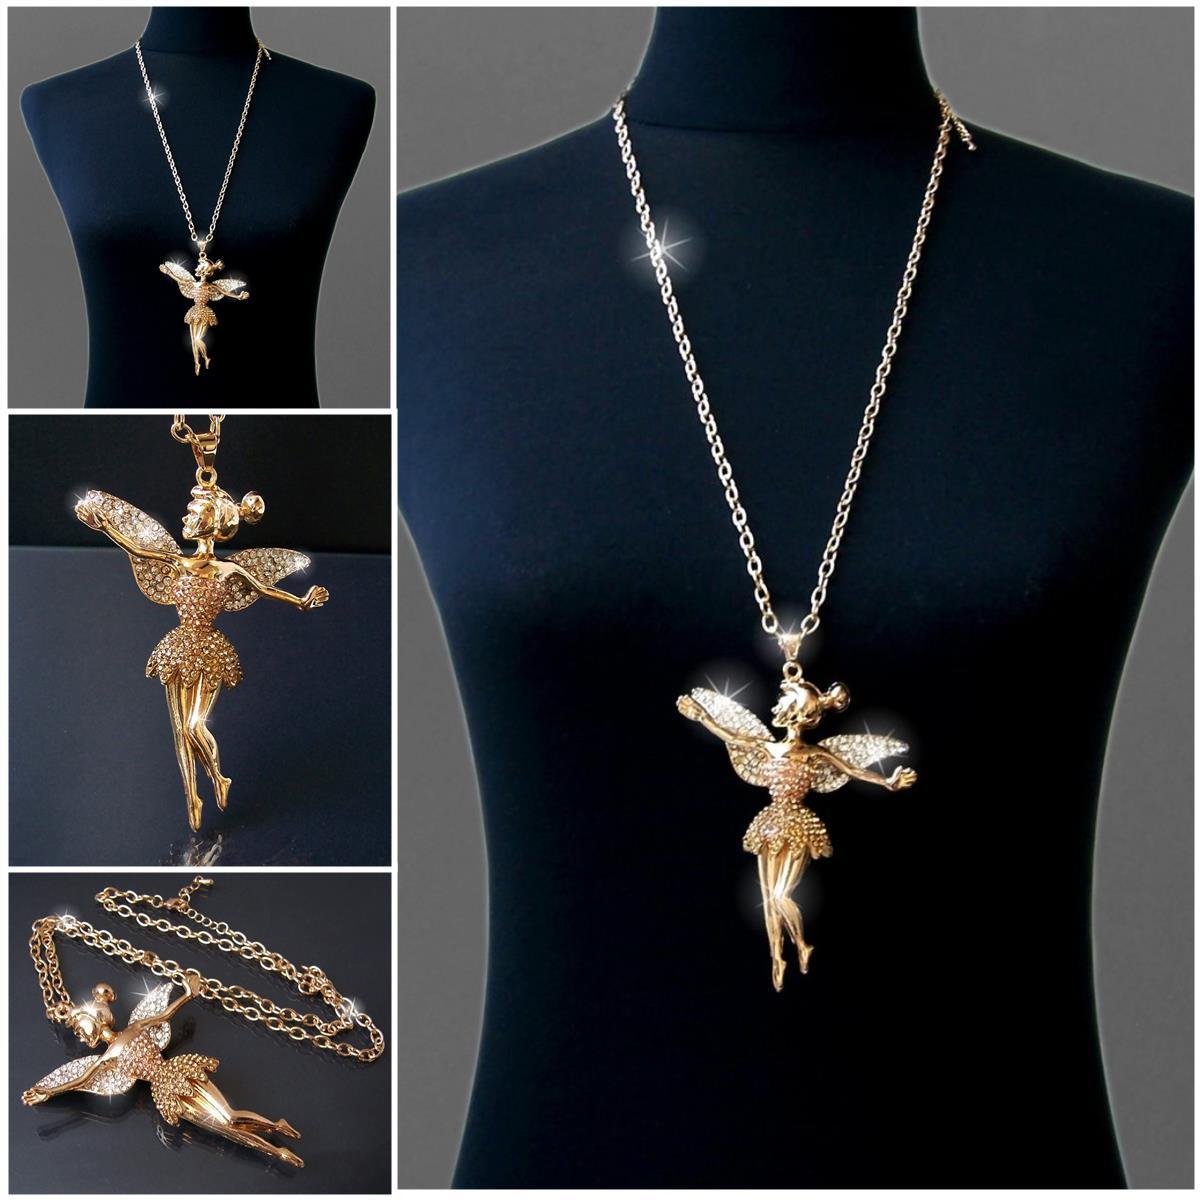 Modeschmuck kette gold  Lange Halskette Kette Silber Gold mit Anhänger Strass Zirkonia ...